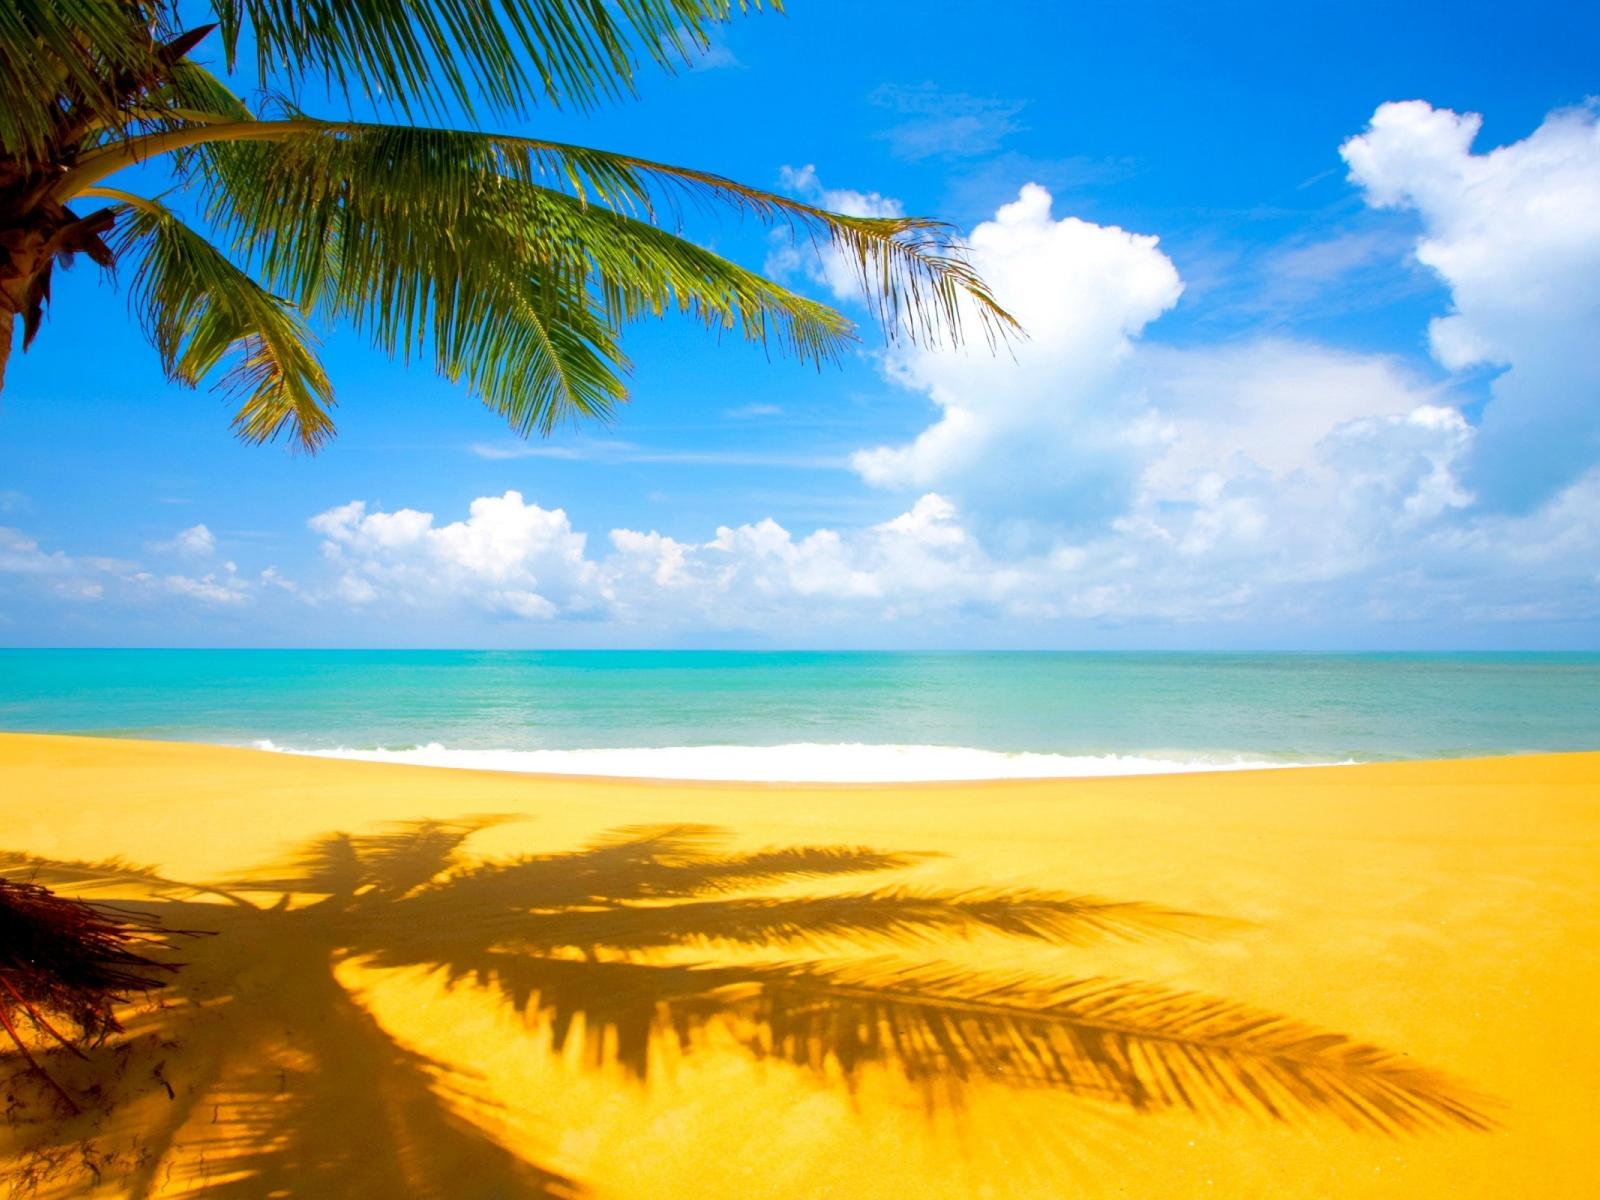 Wallpapernarium Bella Vista De La Playa A La Sombra De Una Palmera